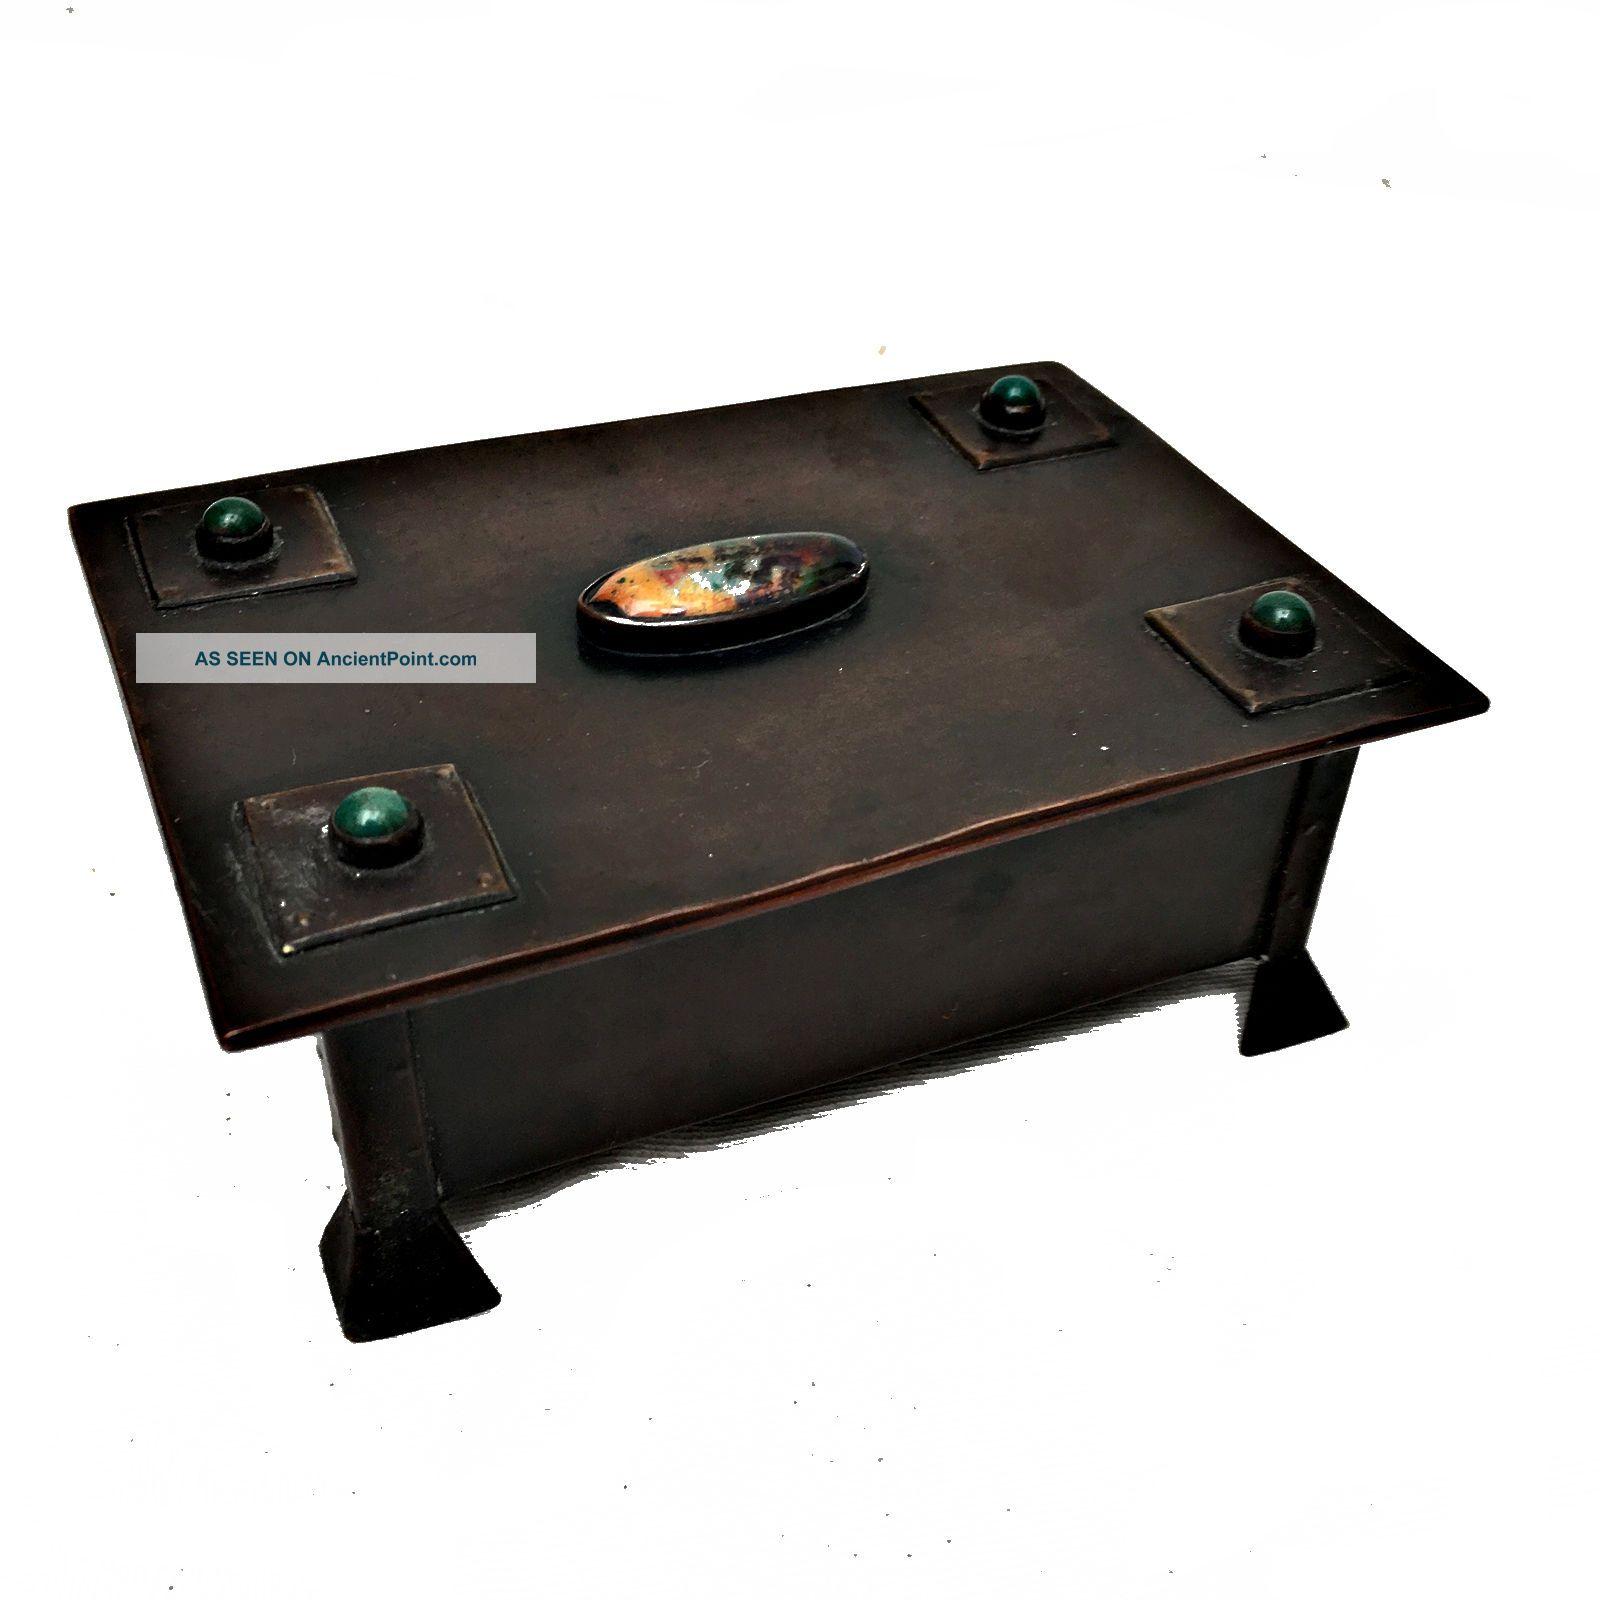 Arts & Crafts Copper Trinket Box Enamel/ruskin Cabochons Rivets Circa 1900 Arts & Crafts Movement photo